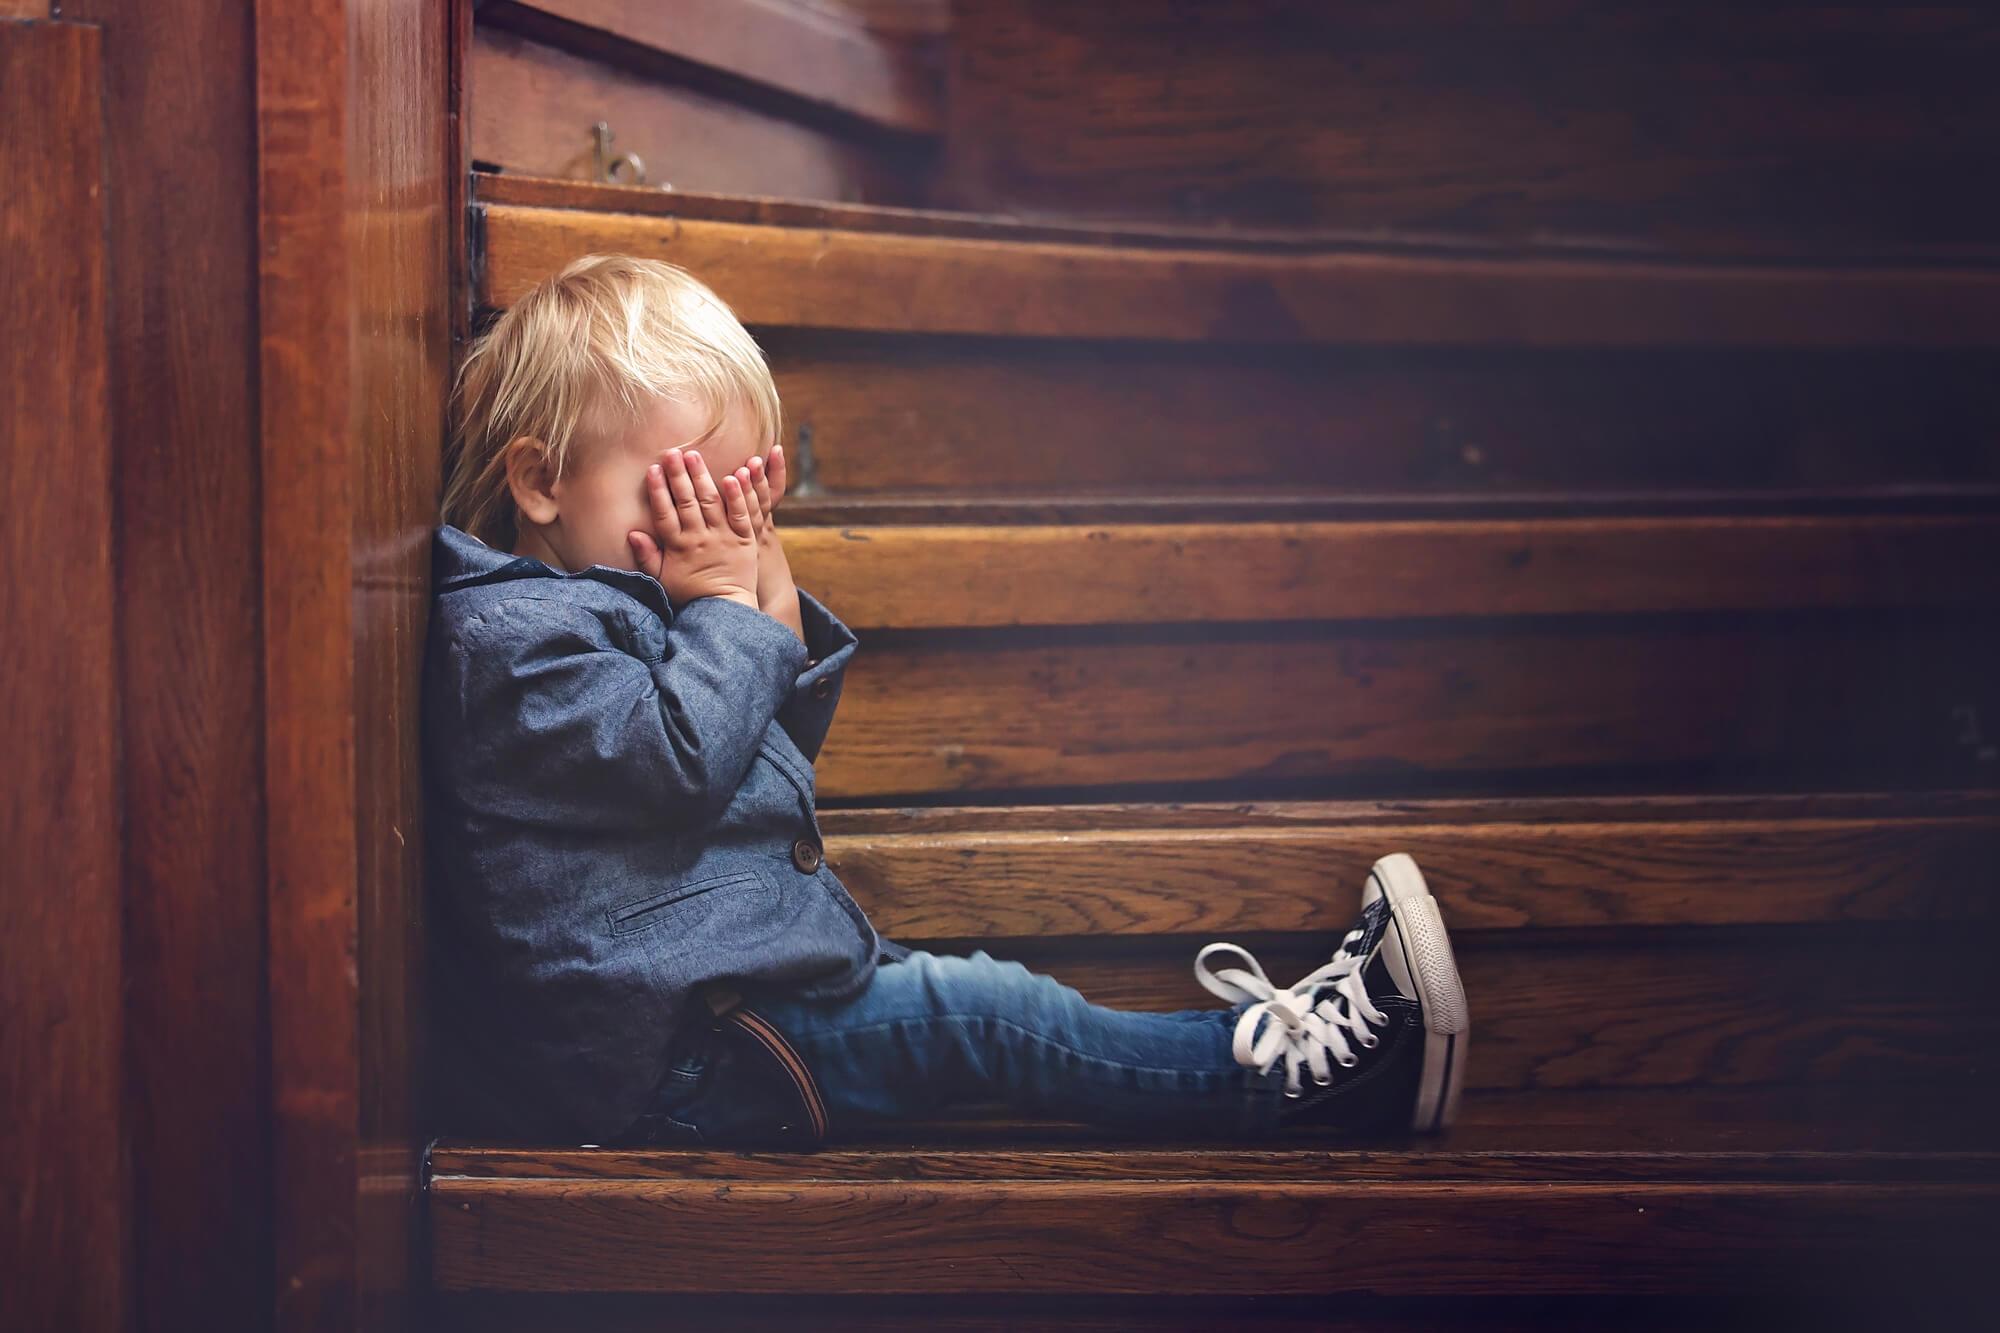 Child Abuse in Las Vegas